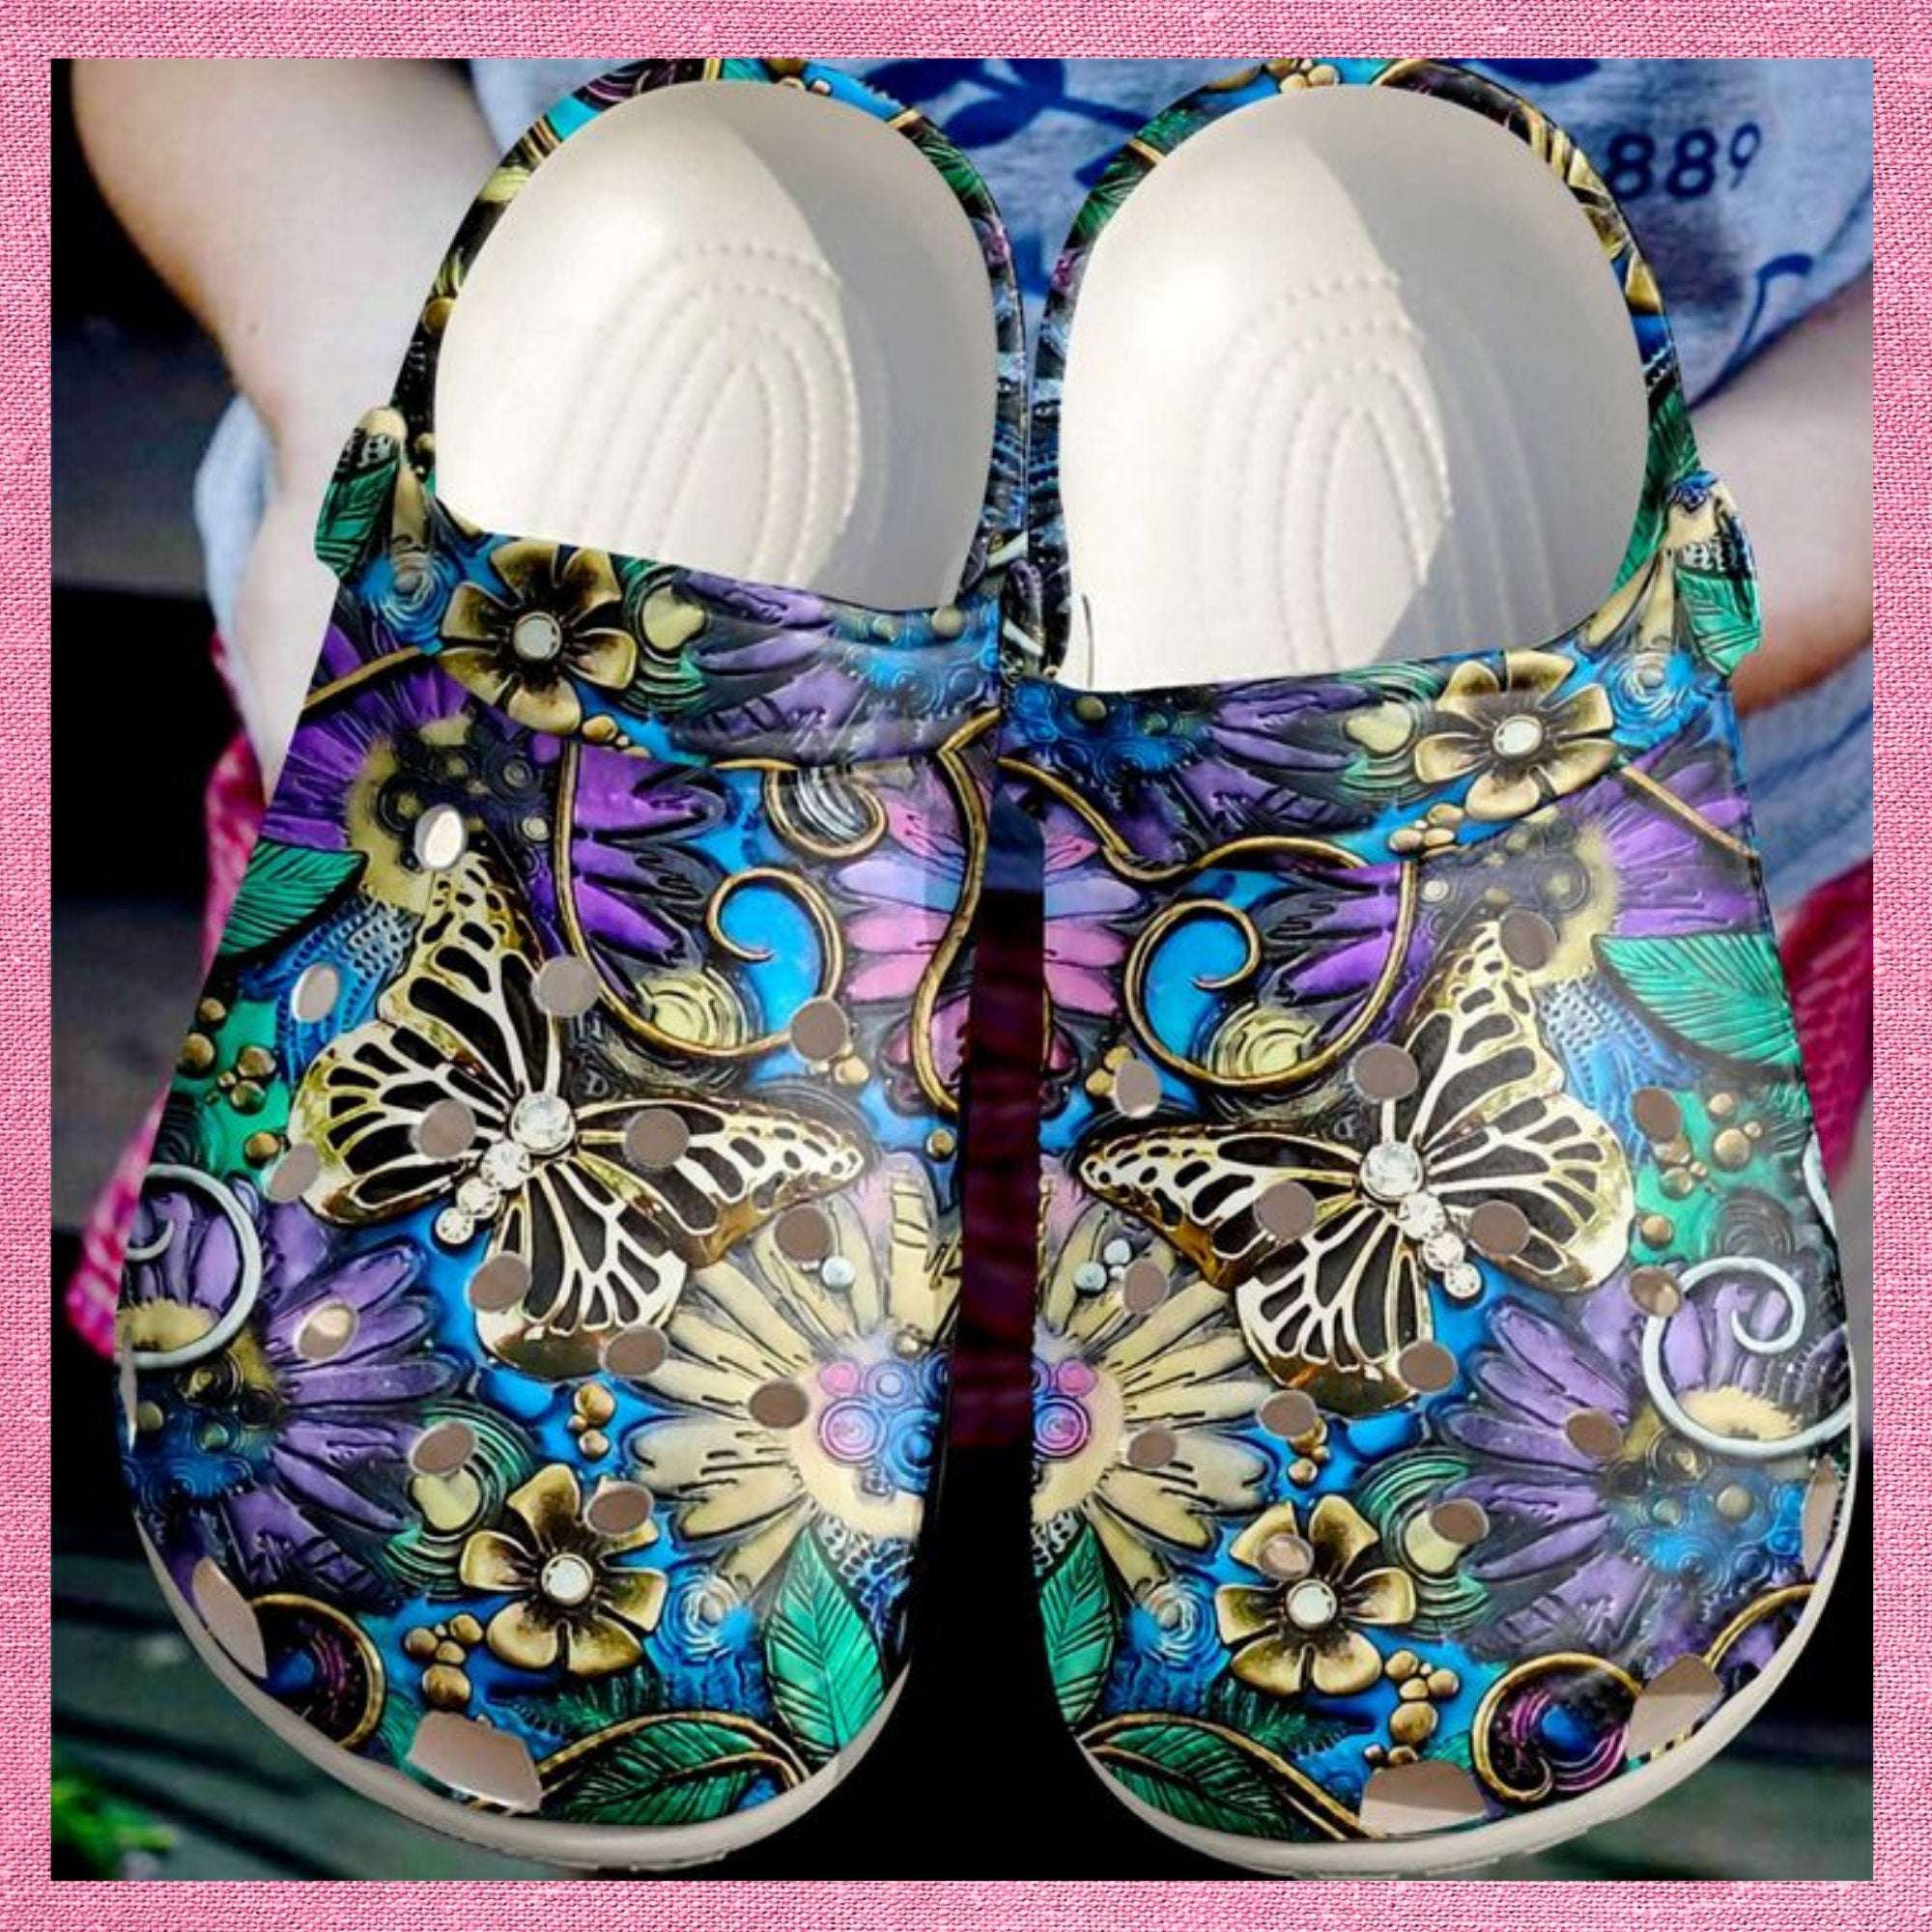 Butterfly Golden Crocs Clog Shoes